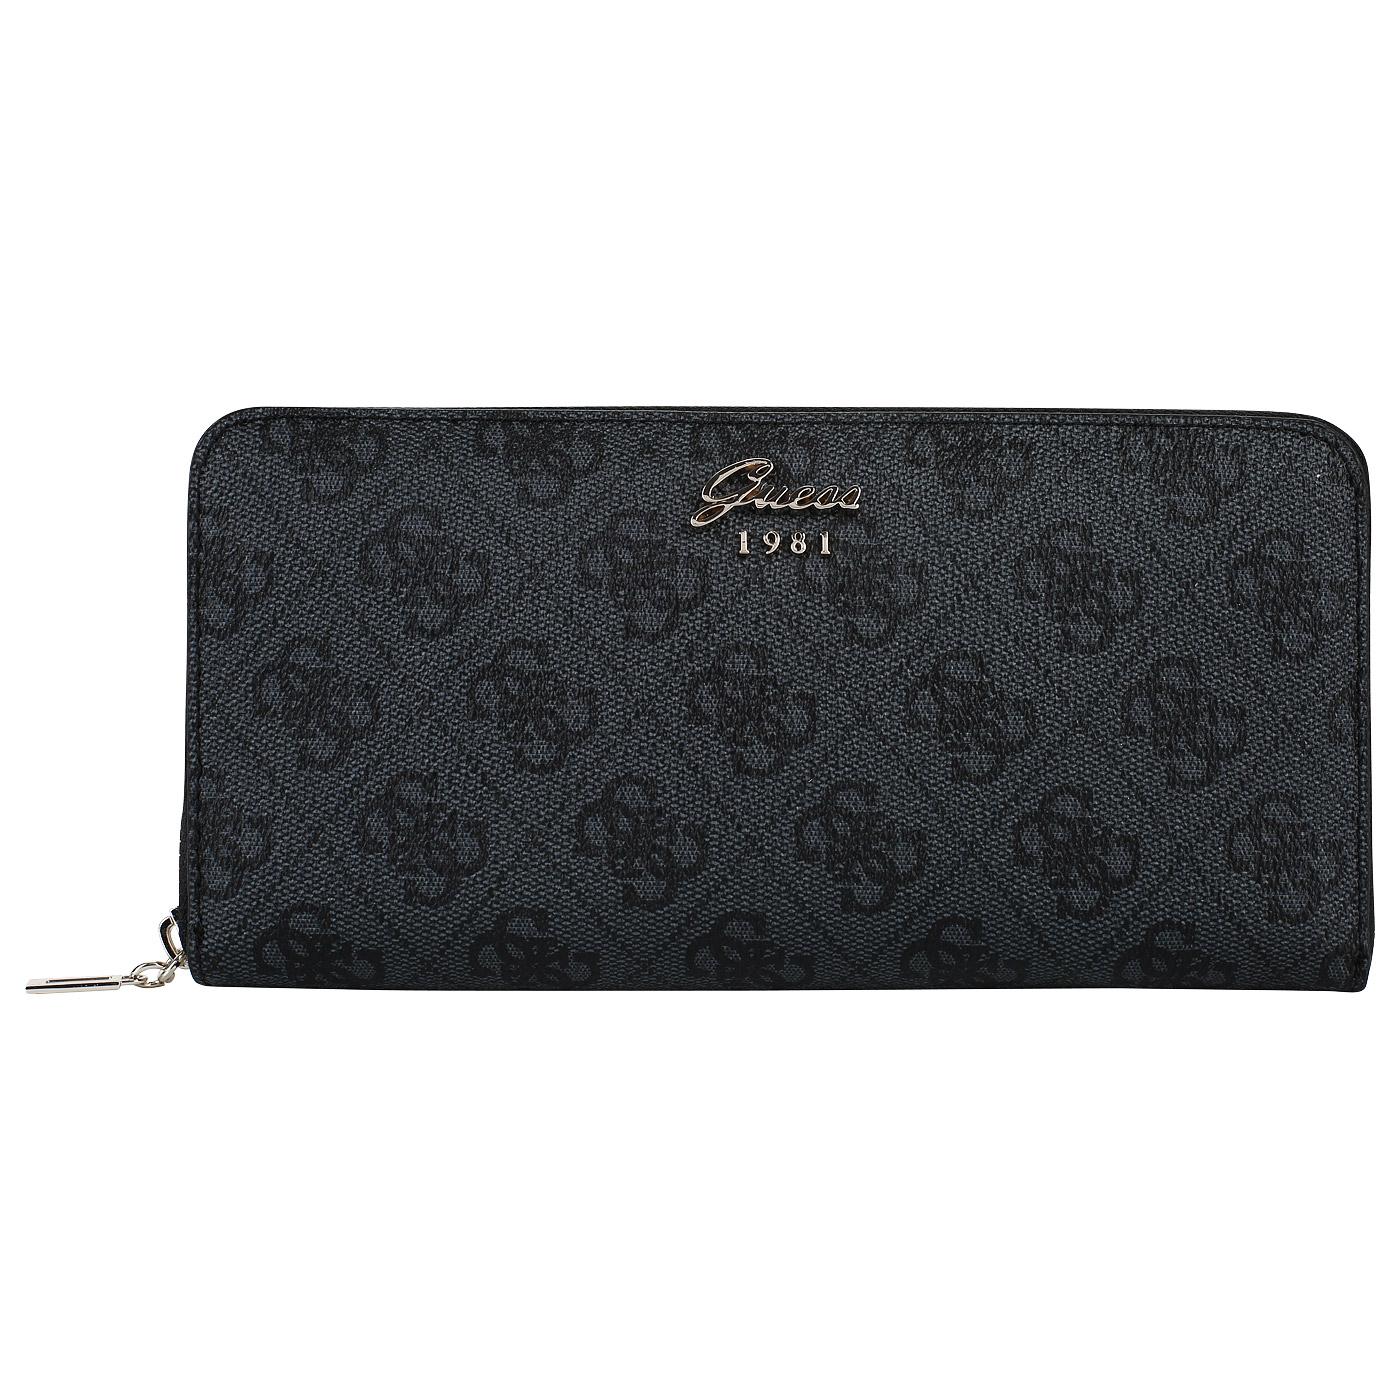 1f2f209a458f Женское портмоне с ремешком на запястье Guess Jayne SWSG69 ...